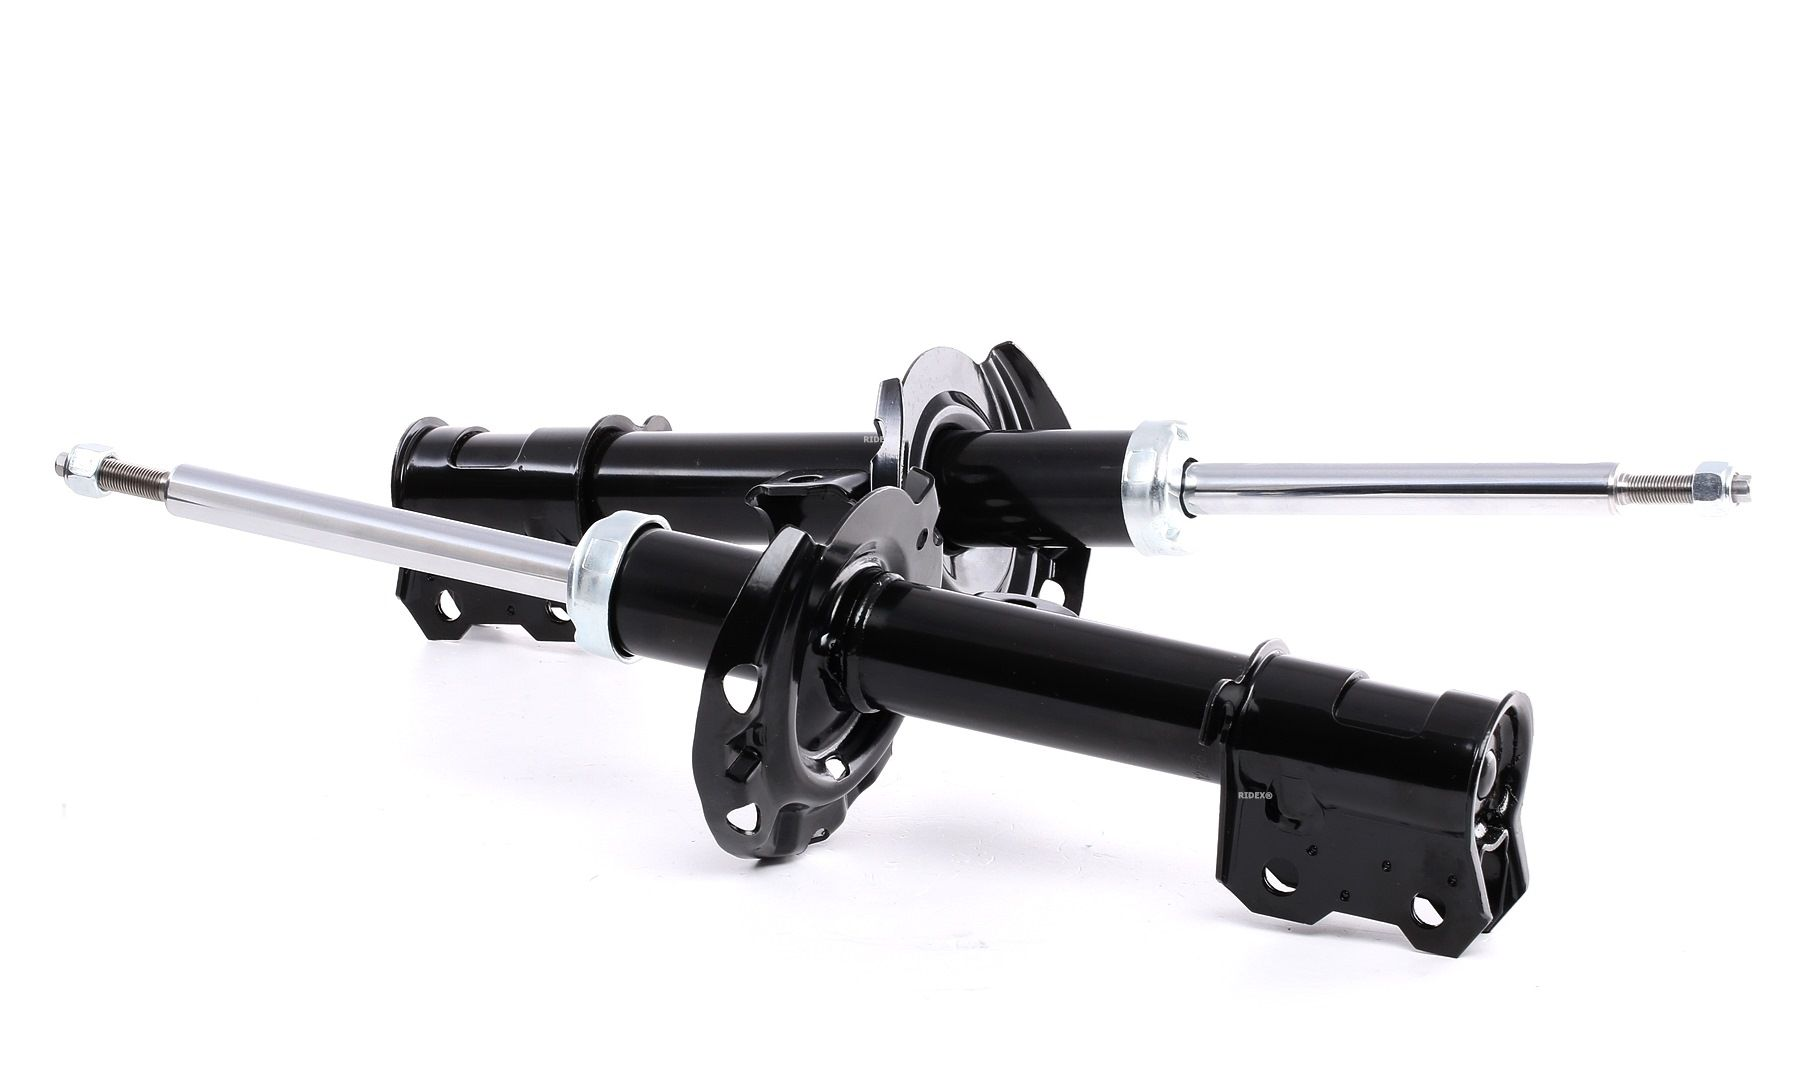 OPEL CORSA 2015 Federbein - Original RIDEX 854S1613 Länge: 497mm, Ø: 45mm, Ø: 45mm